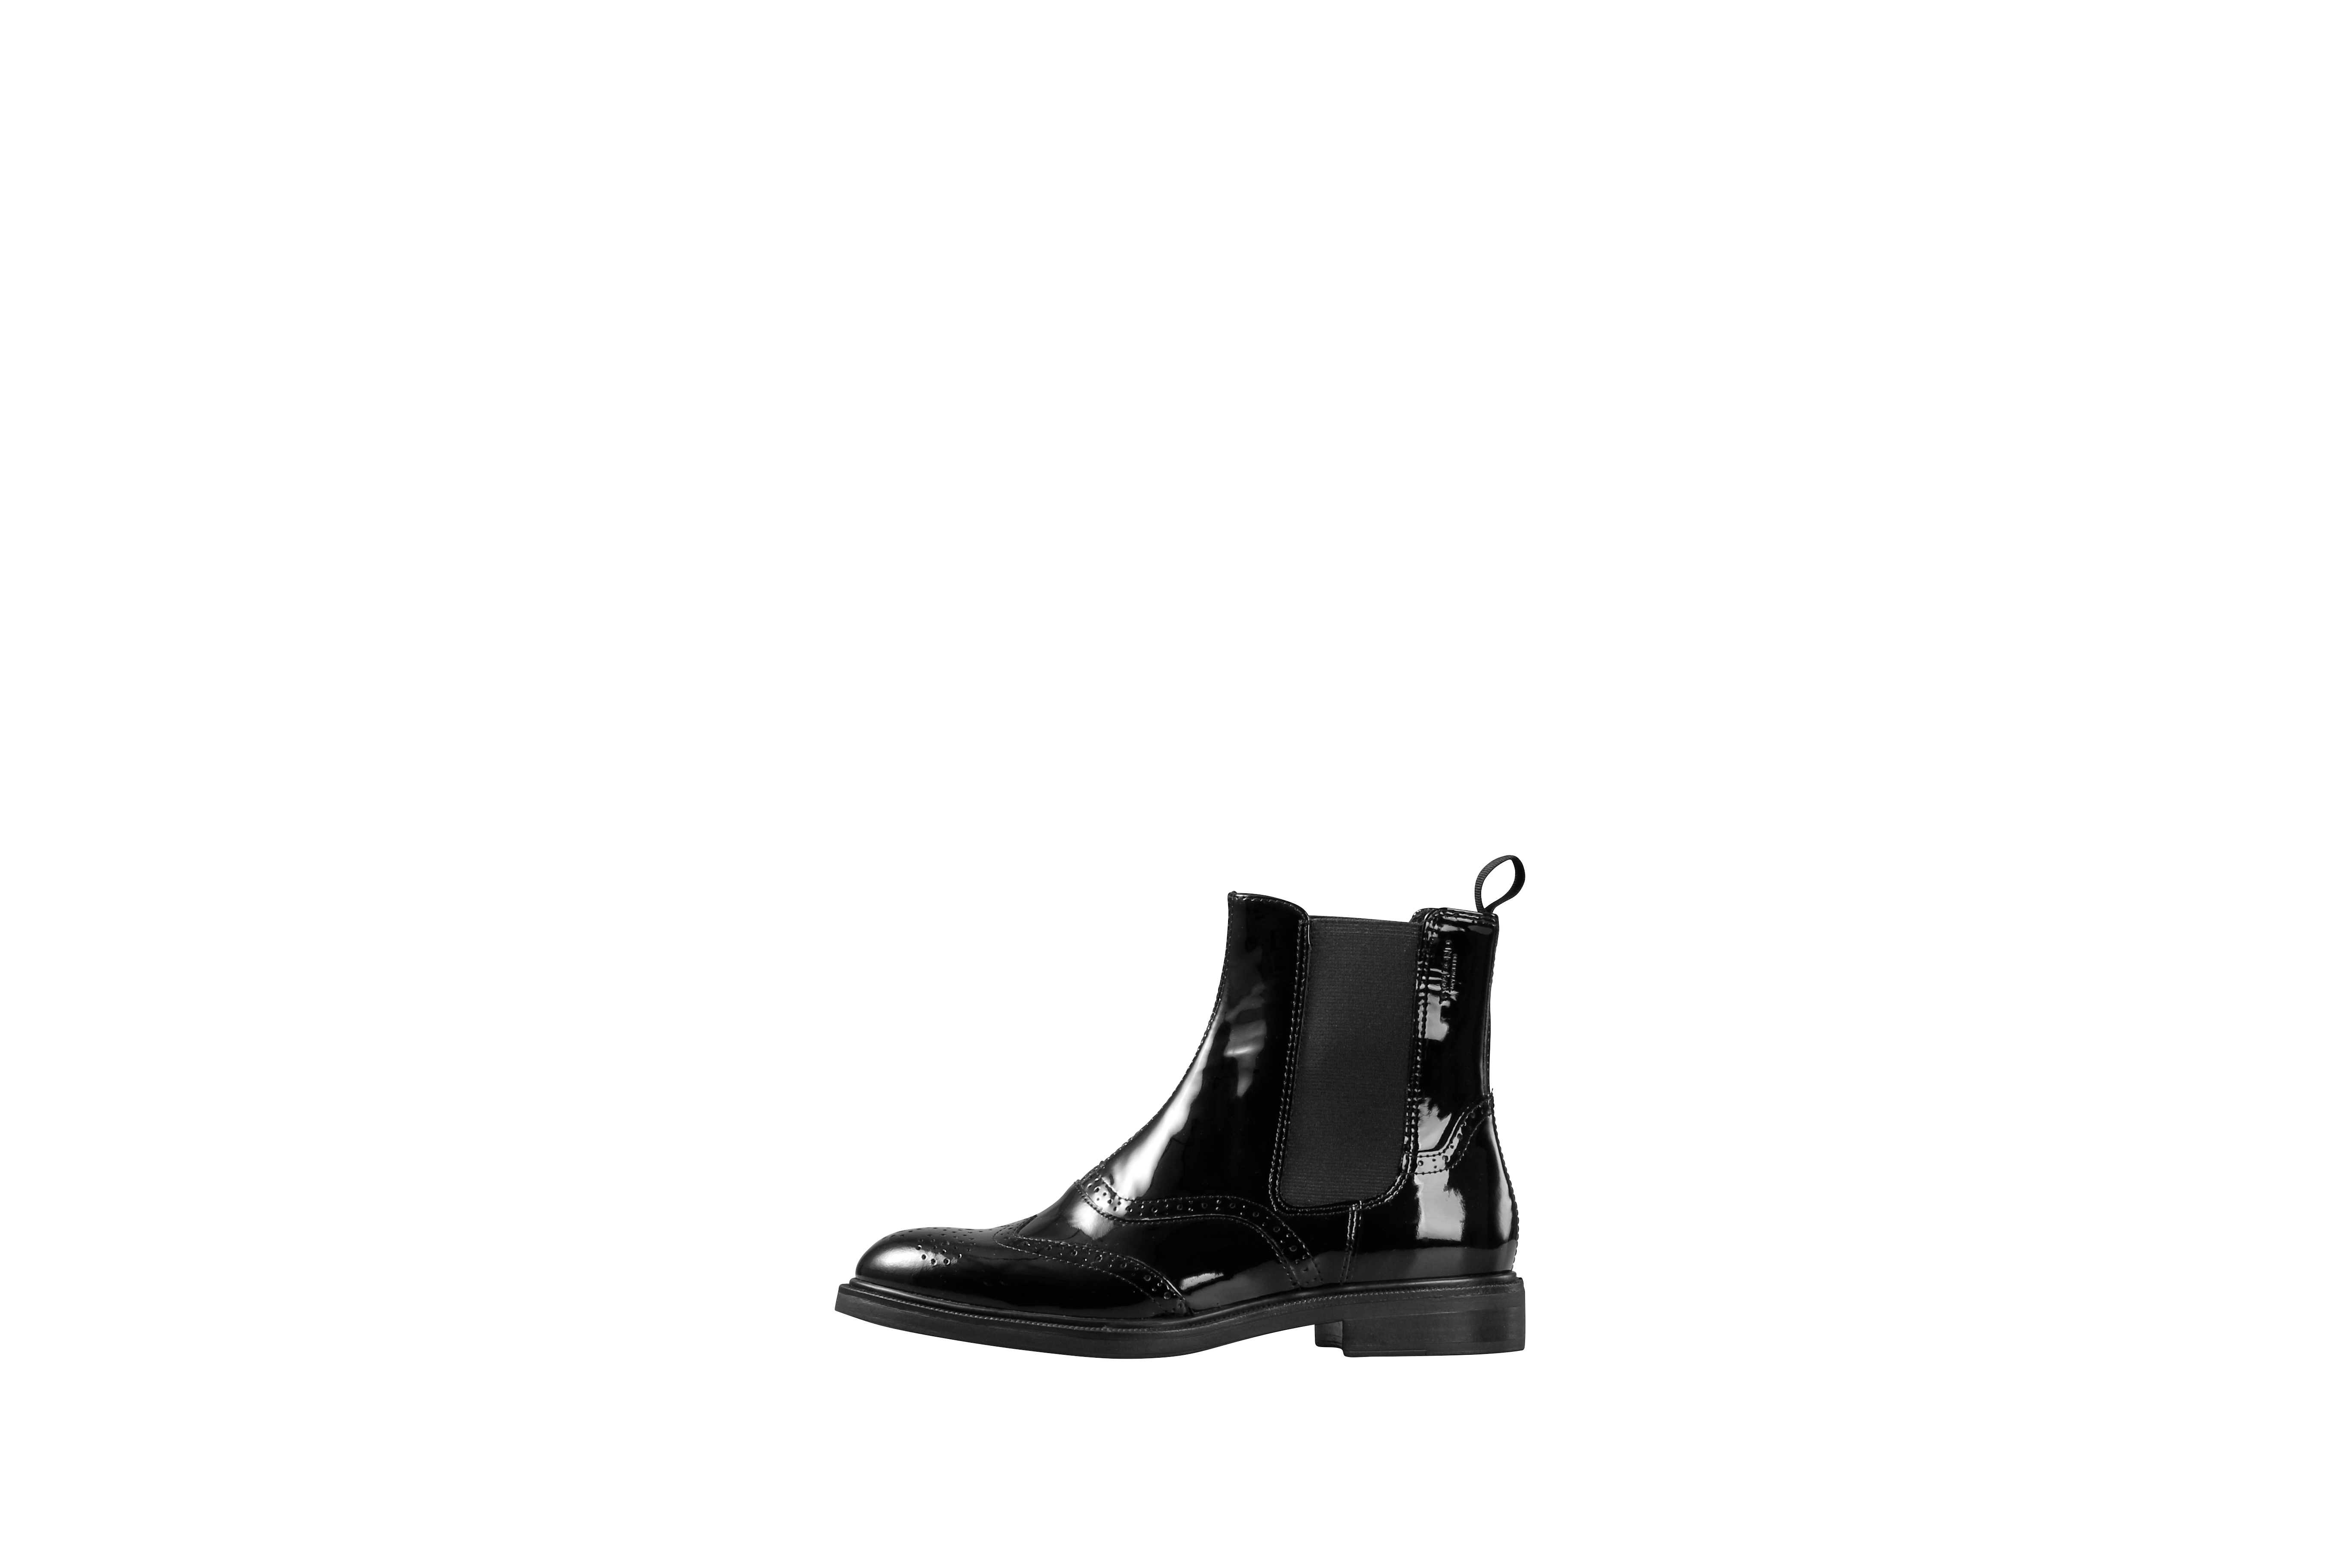 Vagabond Amina støvle